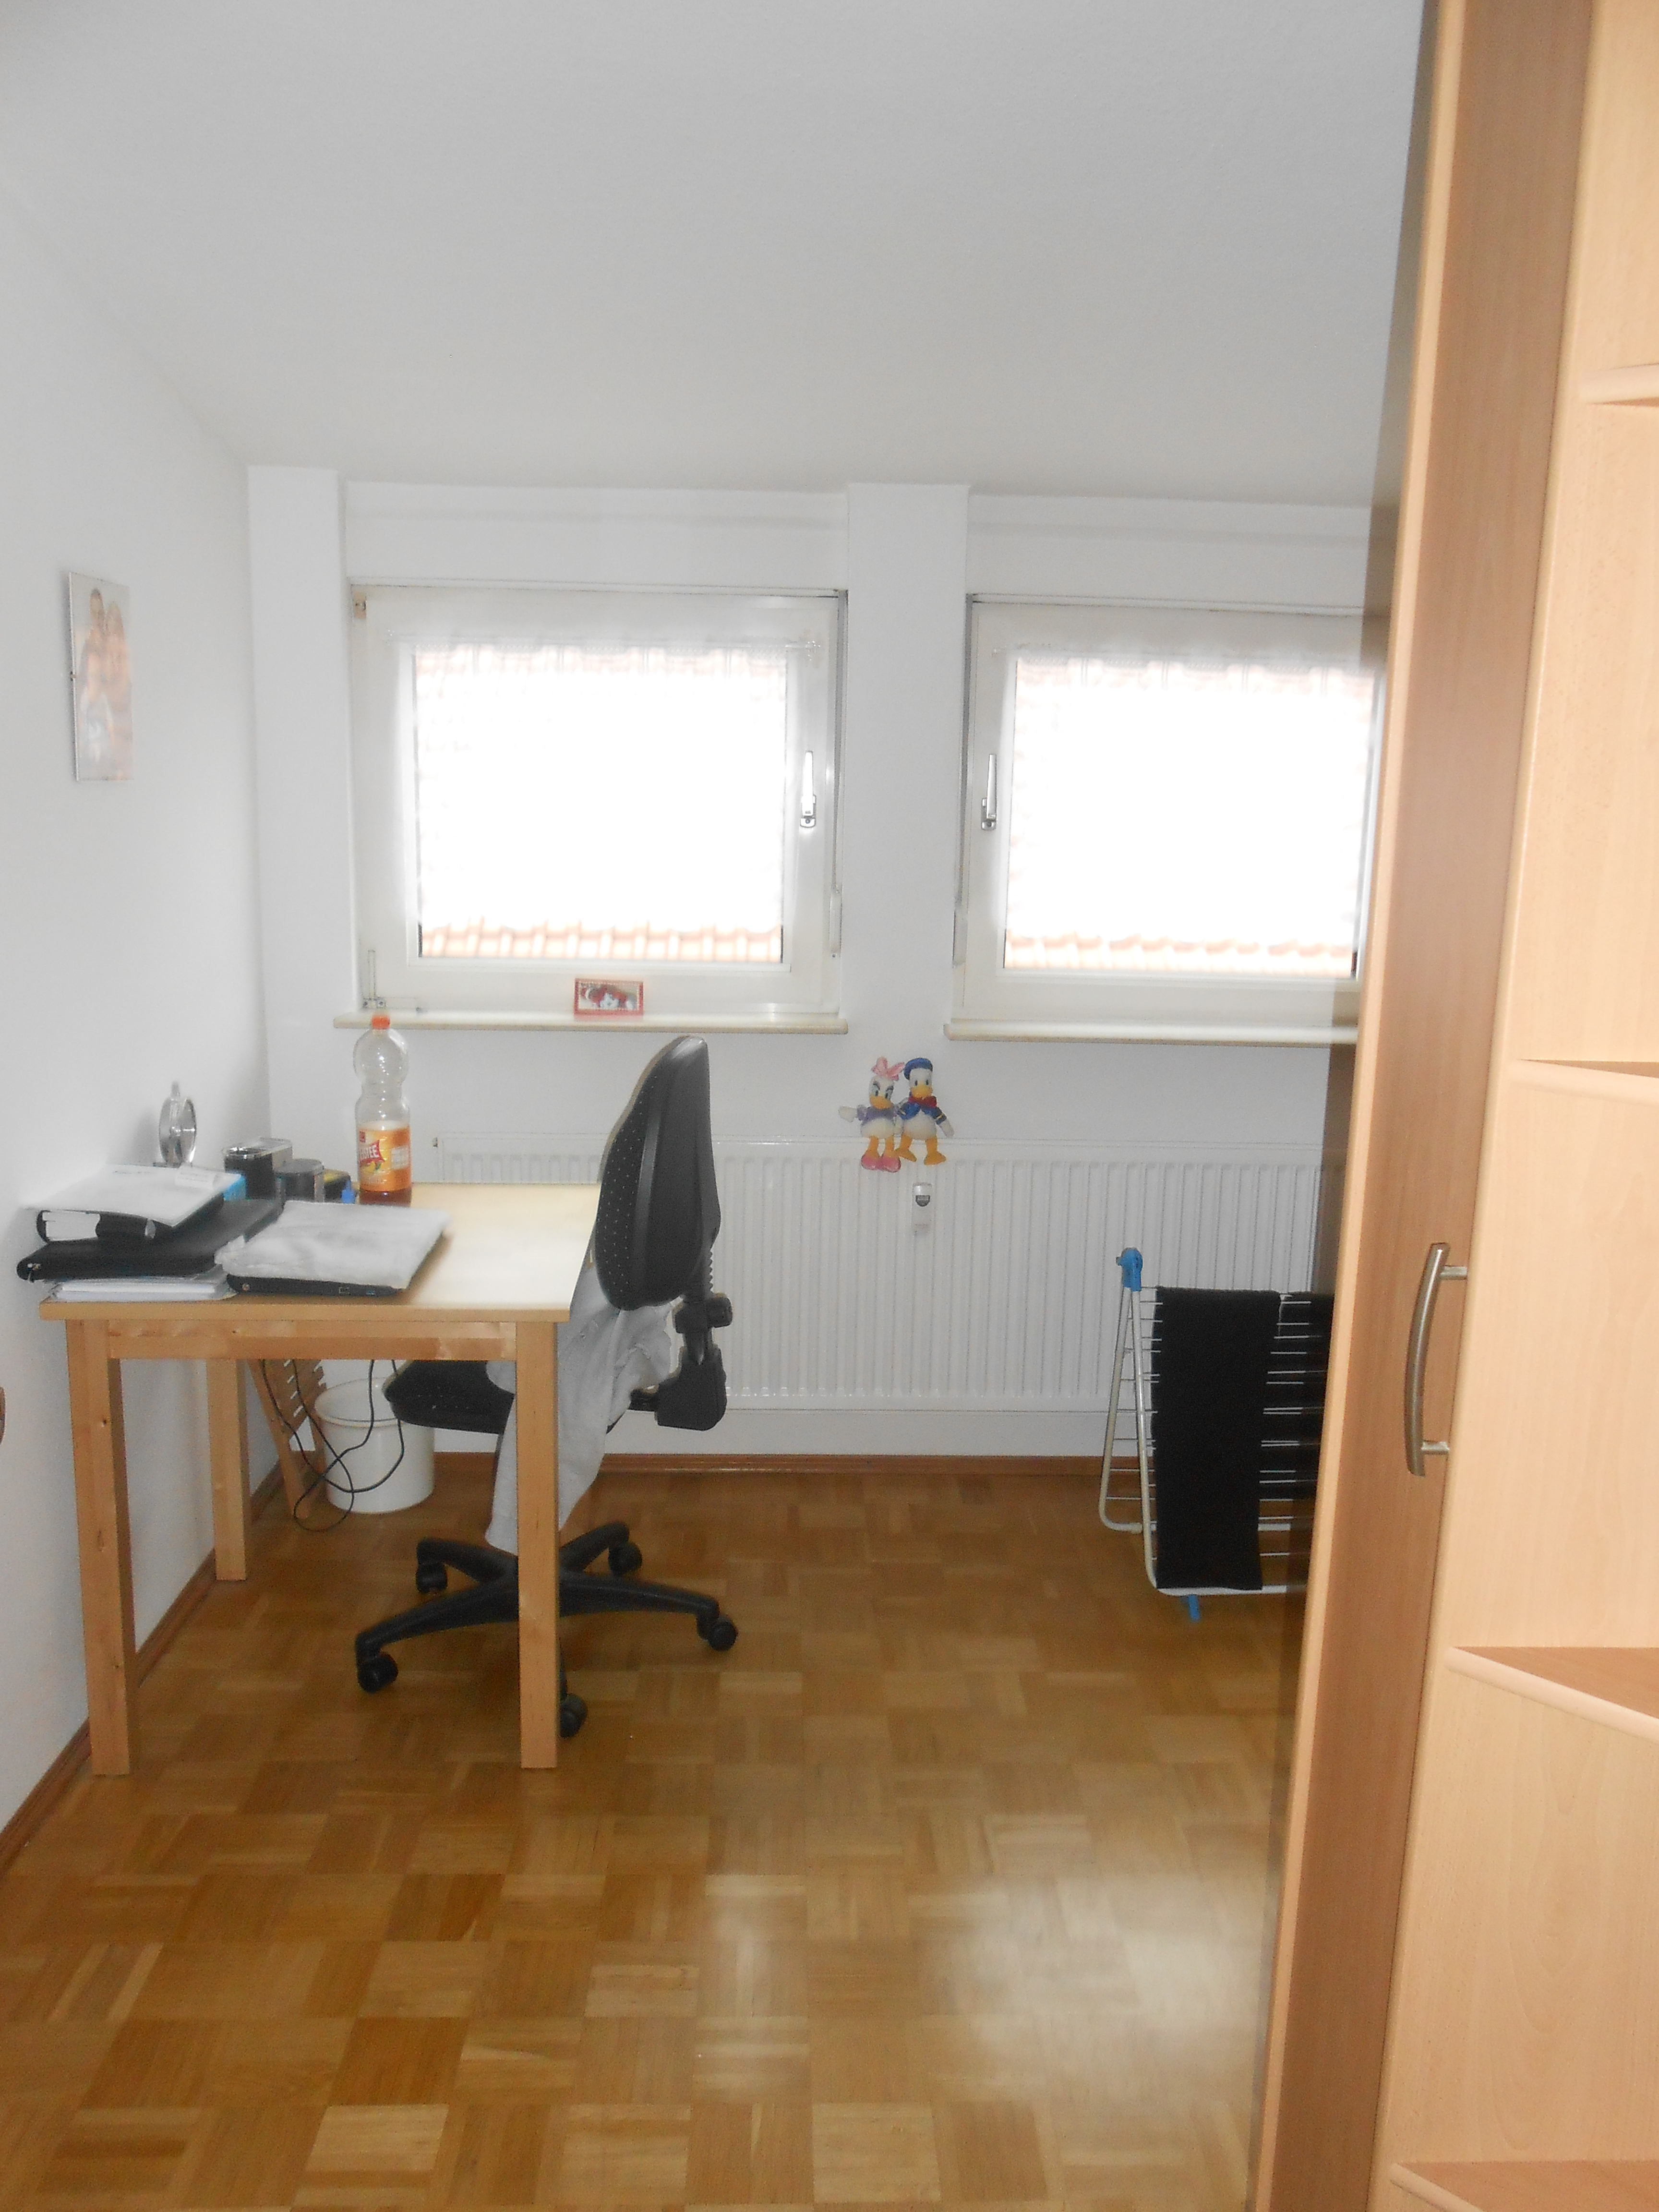 Wohnung mieten ruesselsheim 3 zimmer 8 hettich immobilien for Wohnung mieten immobilien